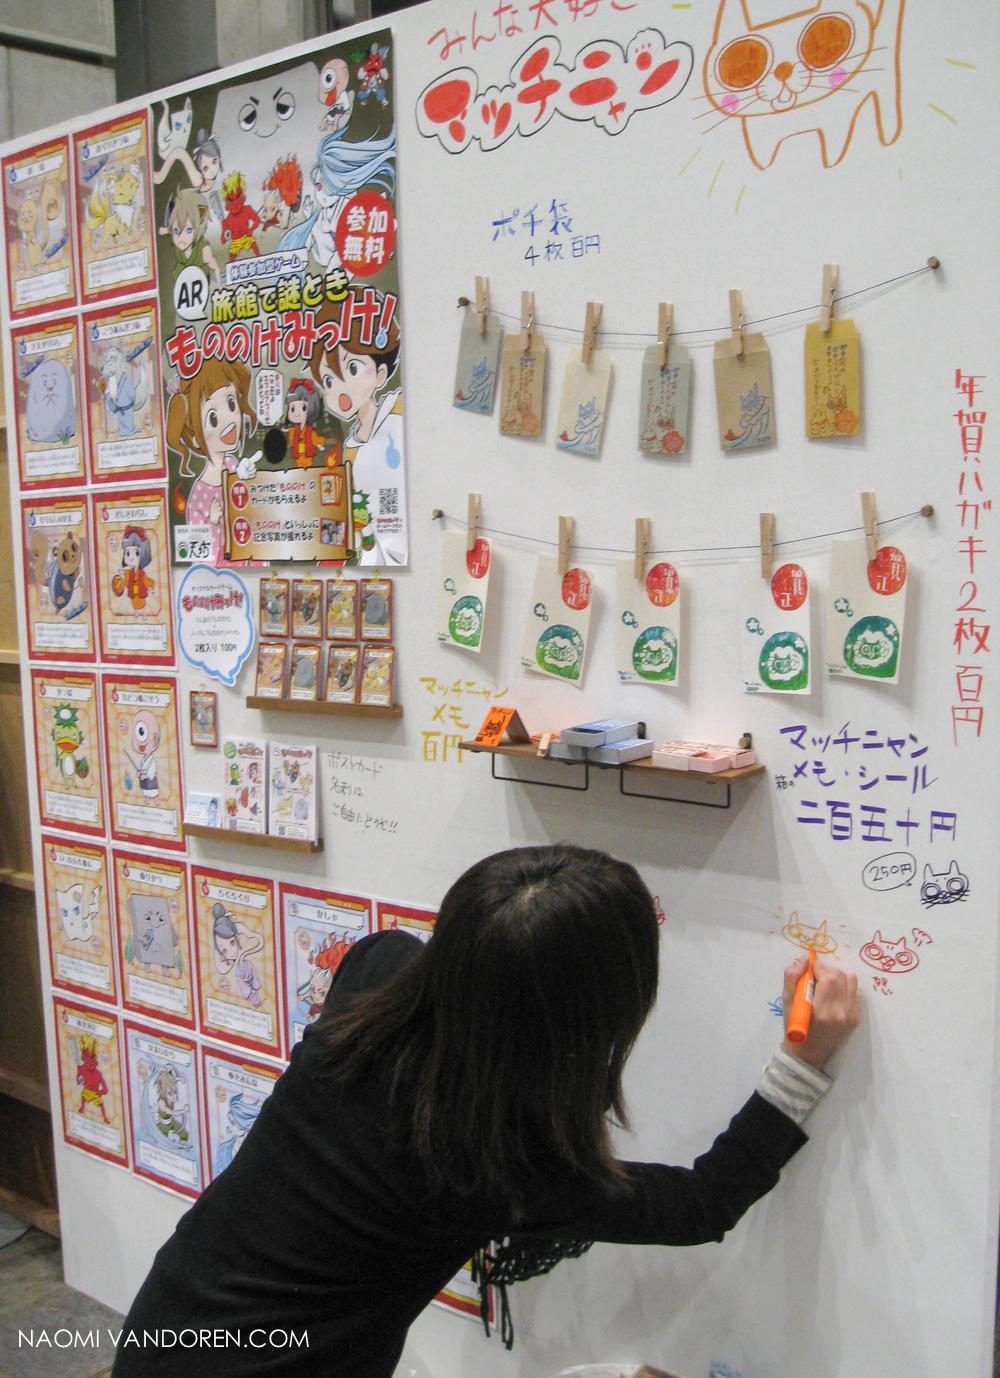 design festa tokyo japan art show naomi vandoren-15.jpg